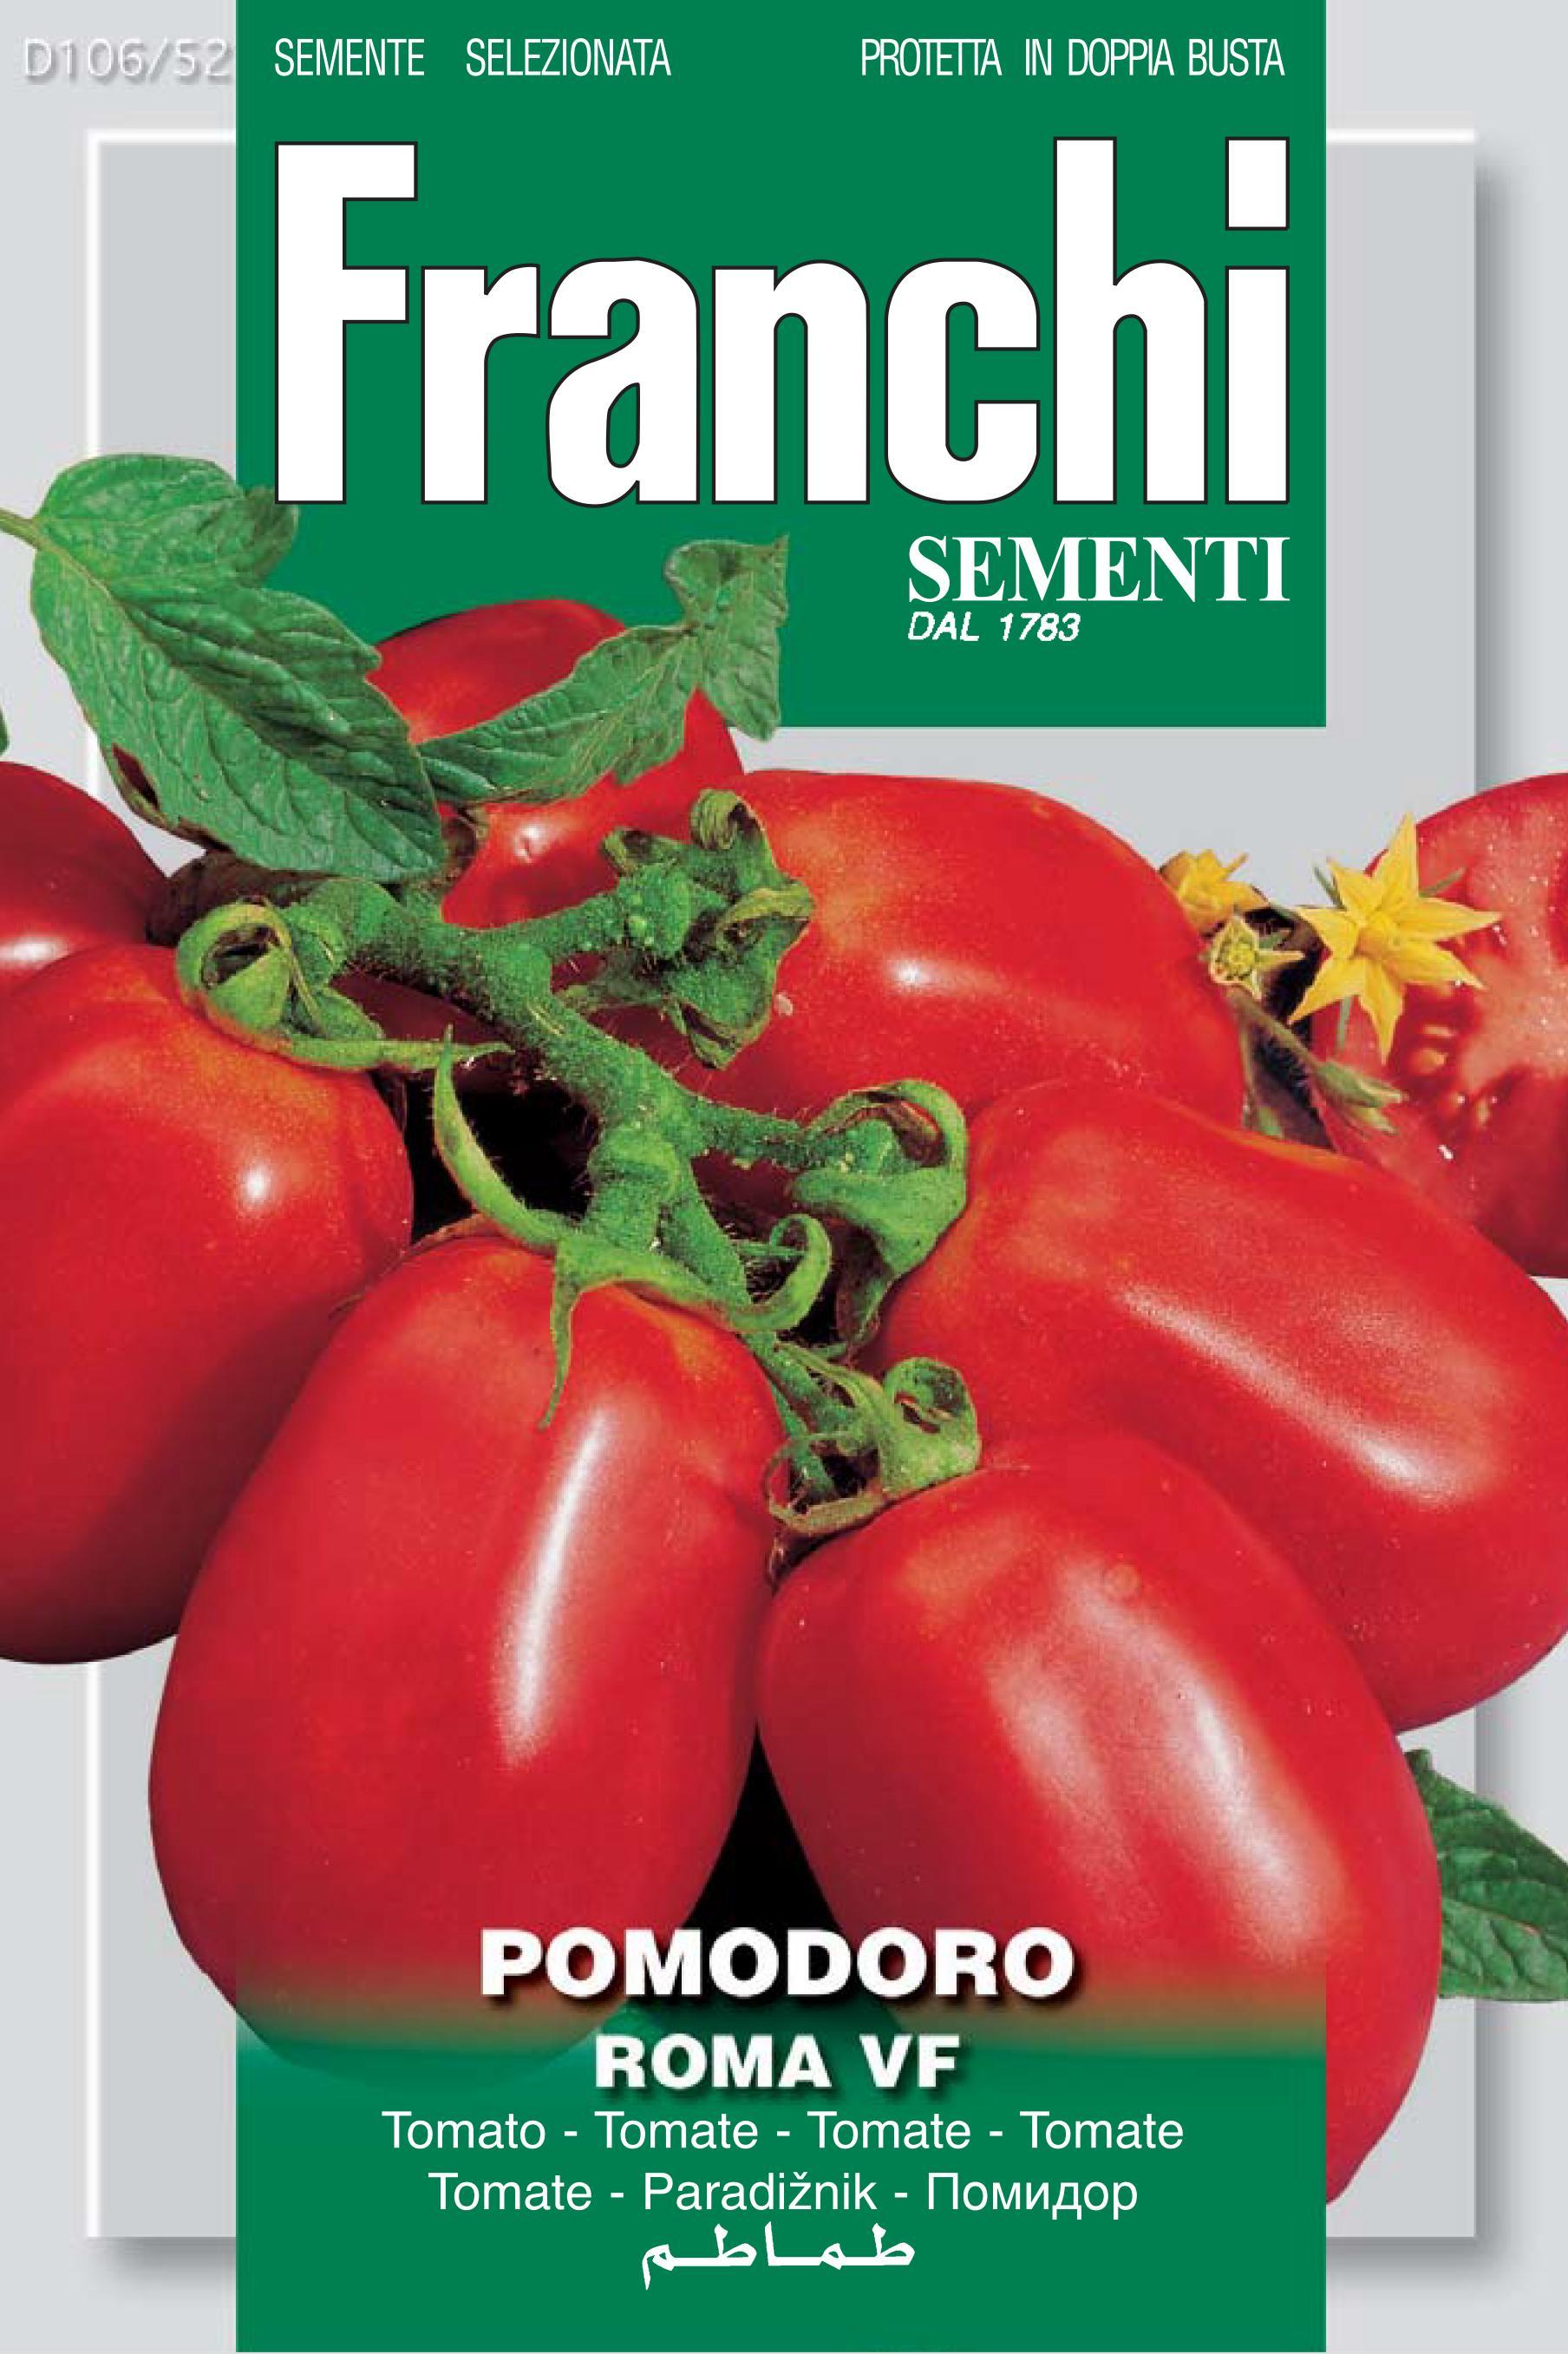 Tomato Roma VF - save 46p (A) Solanum Lycopersicum L.